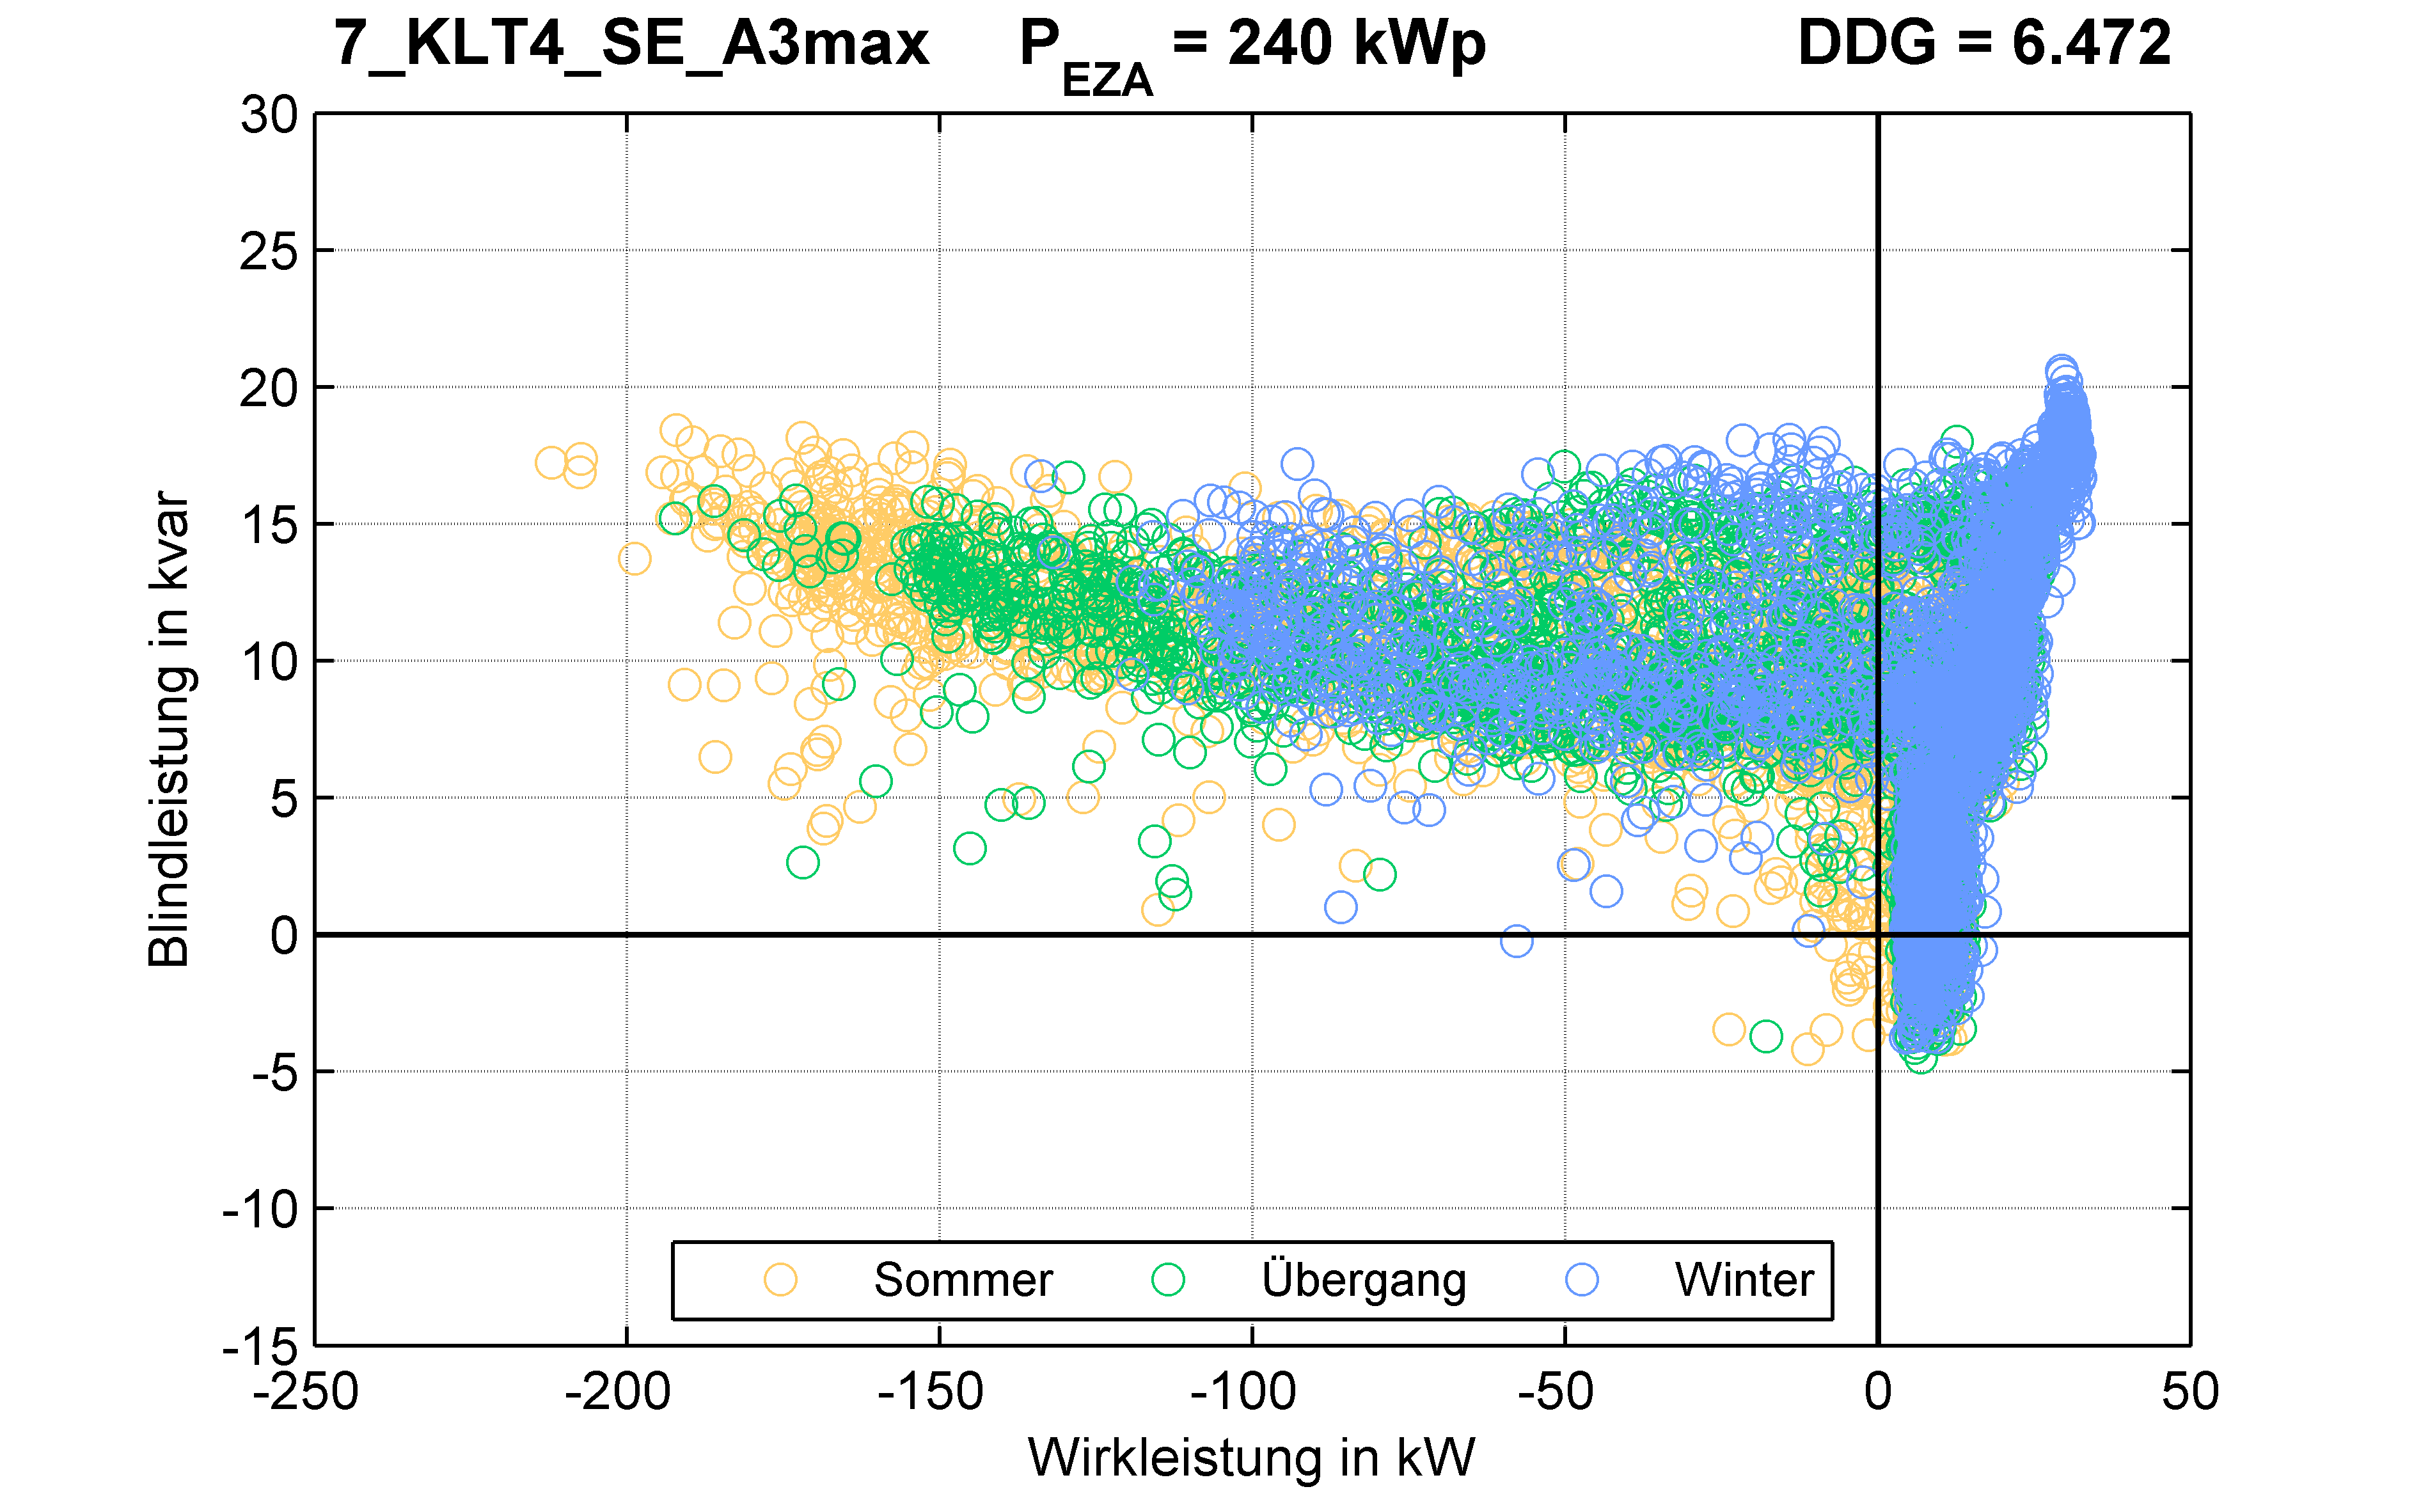 KLT4 | Längsregler (SE) A3max | PQ-Verhalten